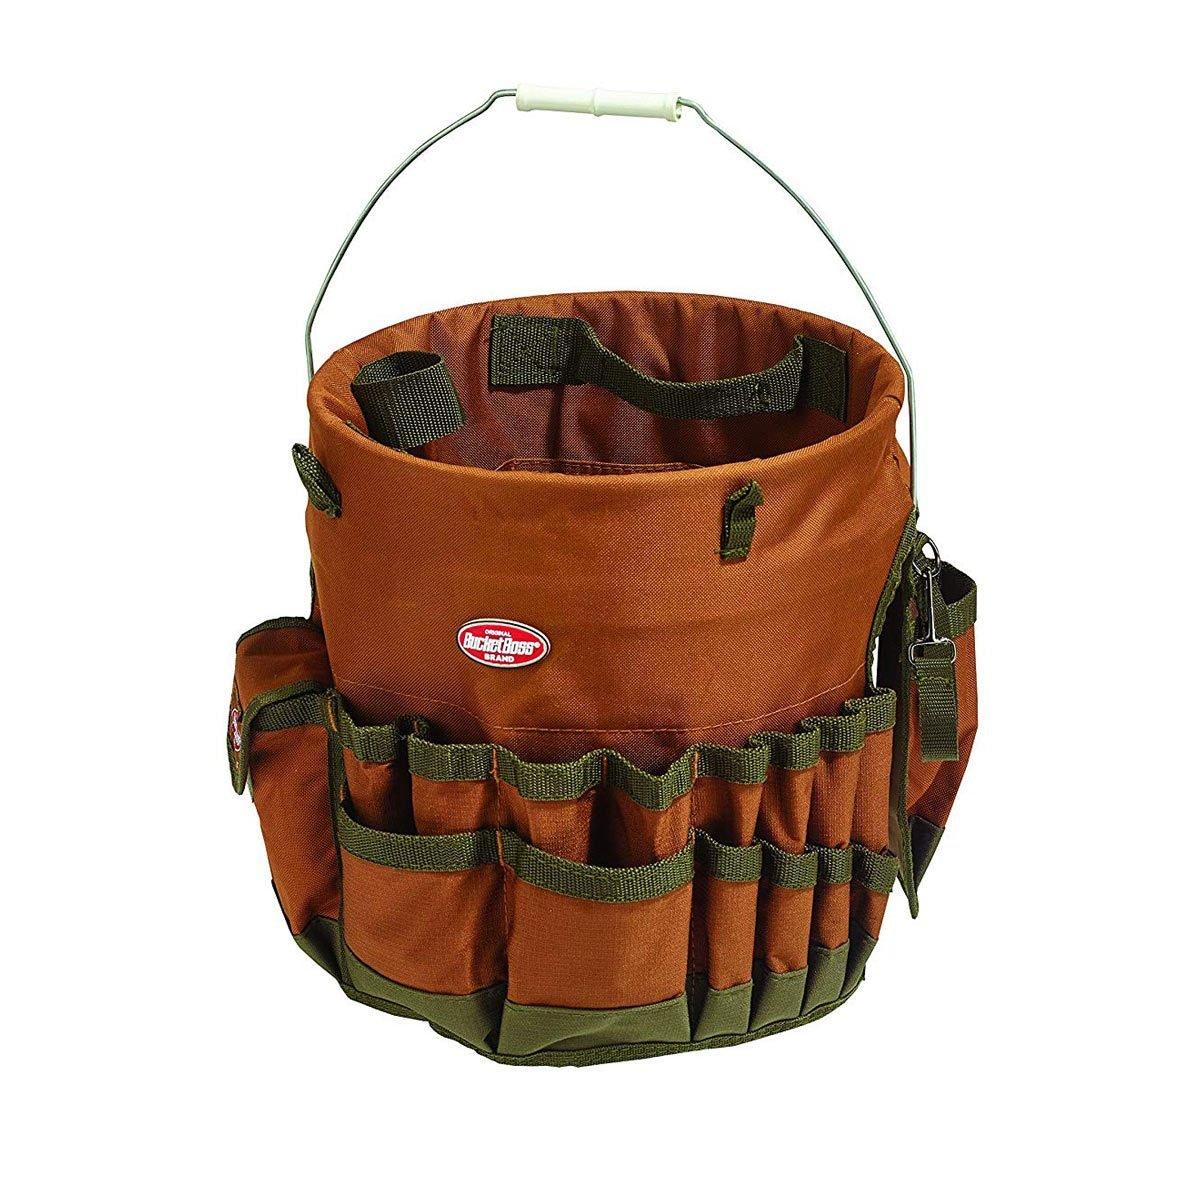 Bucket Boss 10030 The Bucketeer